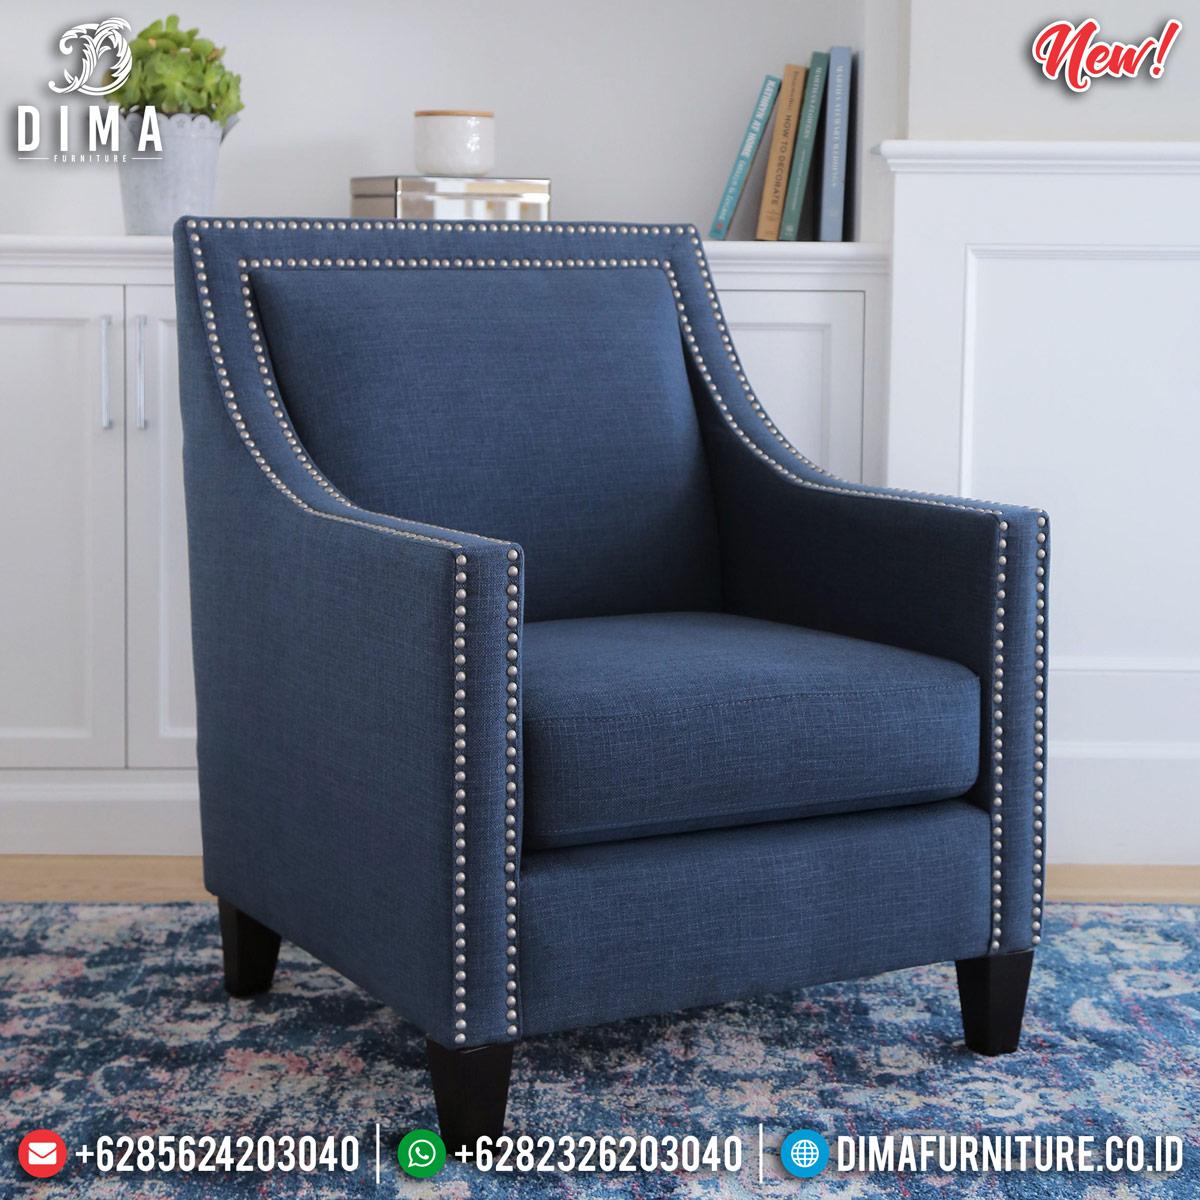 Inspiring Design Sofa Minimalis Jepara New Style Minimalist Modern TTJ-0899